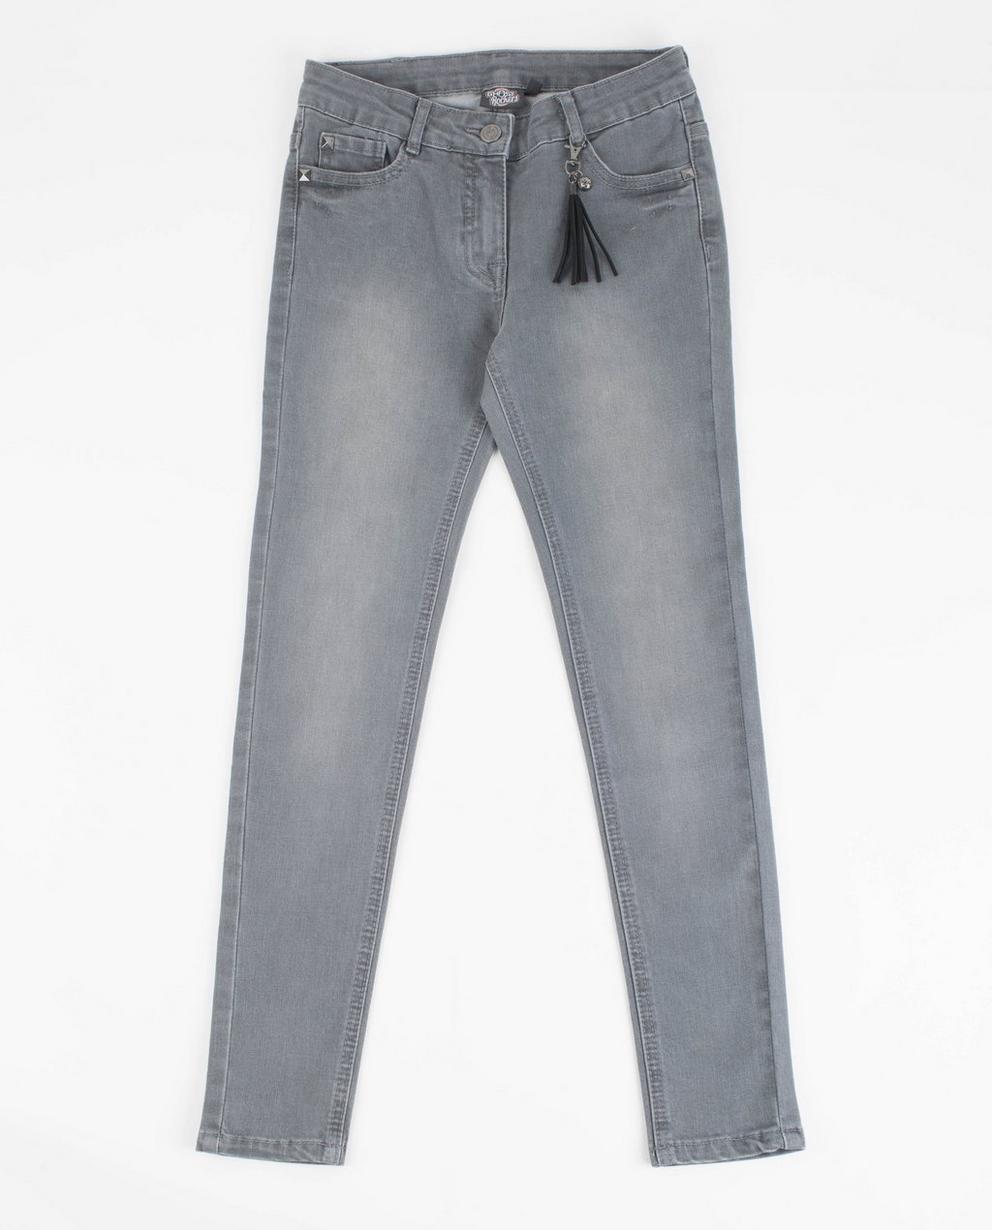 Graue Jeans mit Nieten - Ghost Rockers - Ghost Rockers